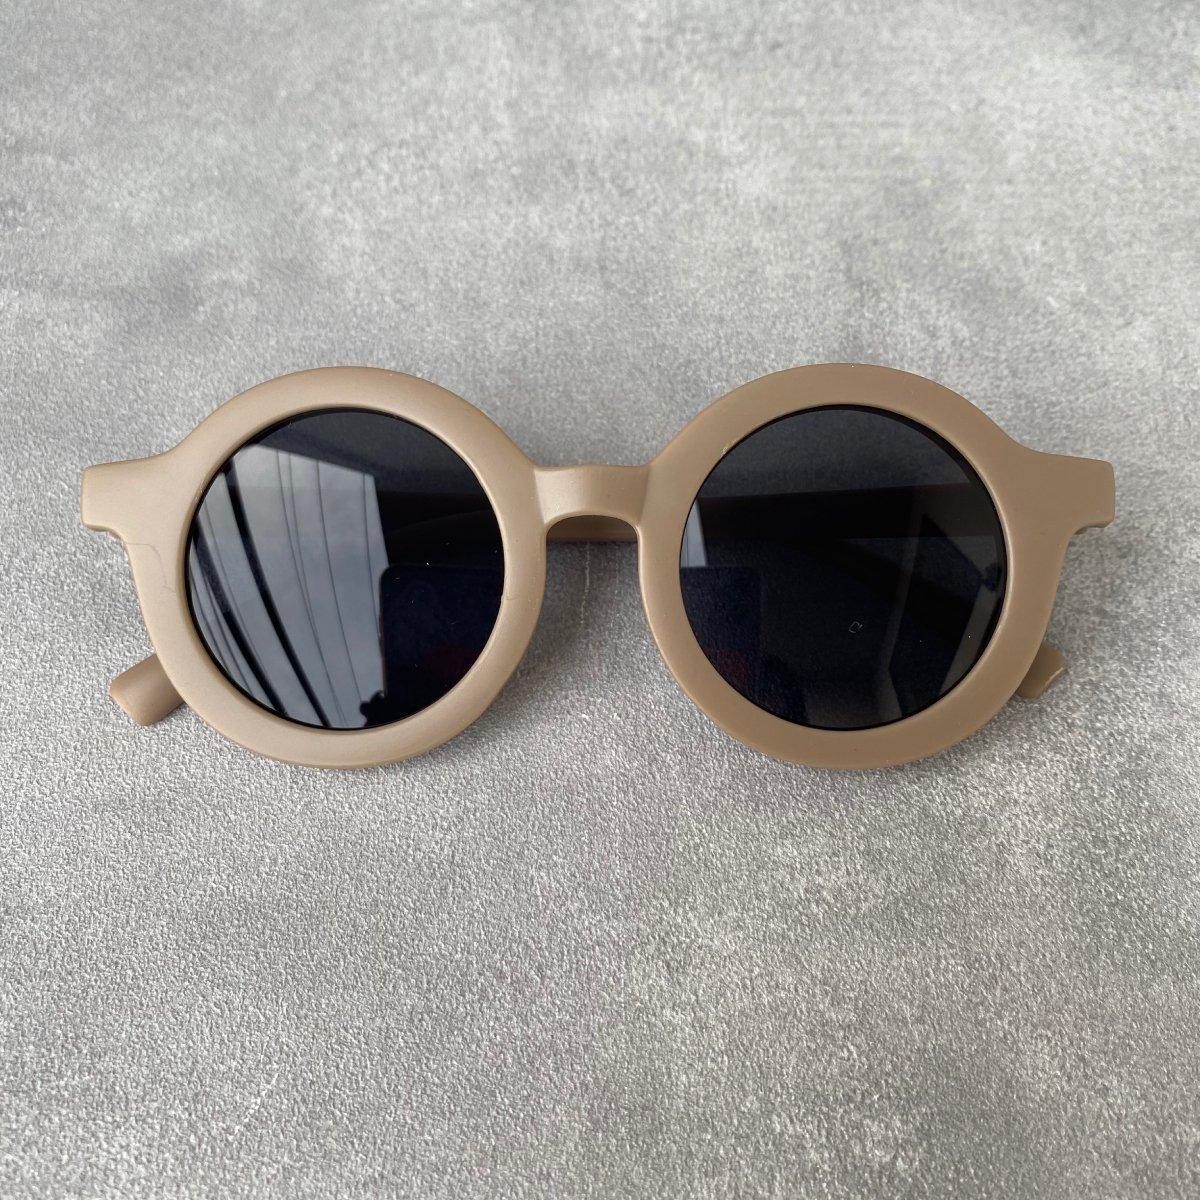 【KIDS】Kids Colorful Sunglasses 詳細画像1